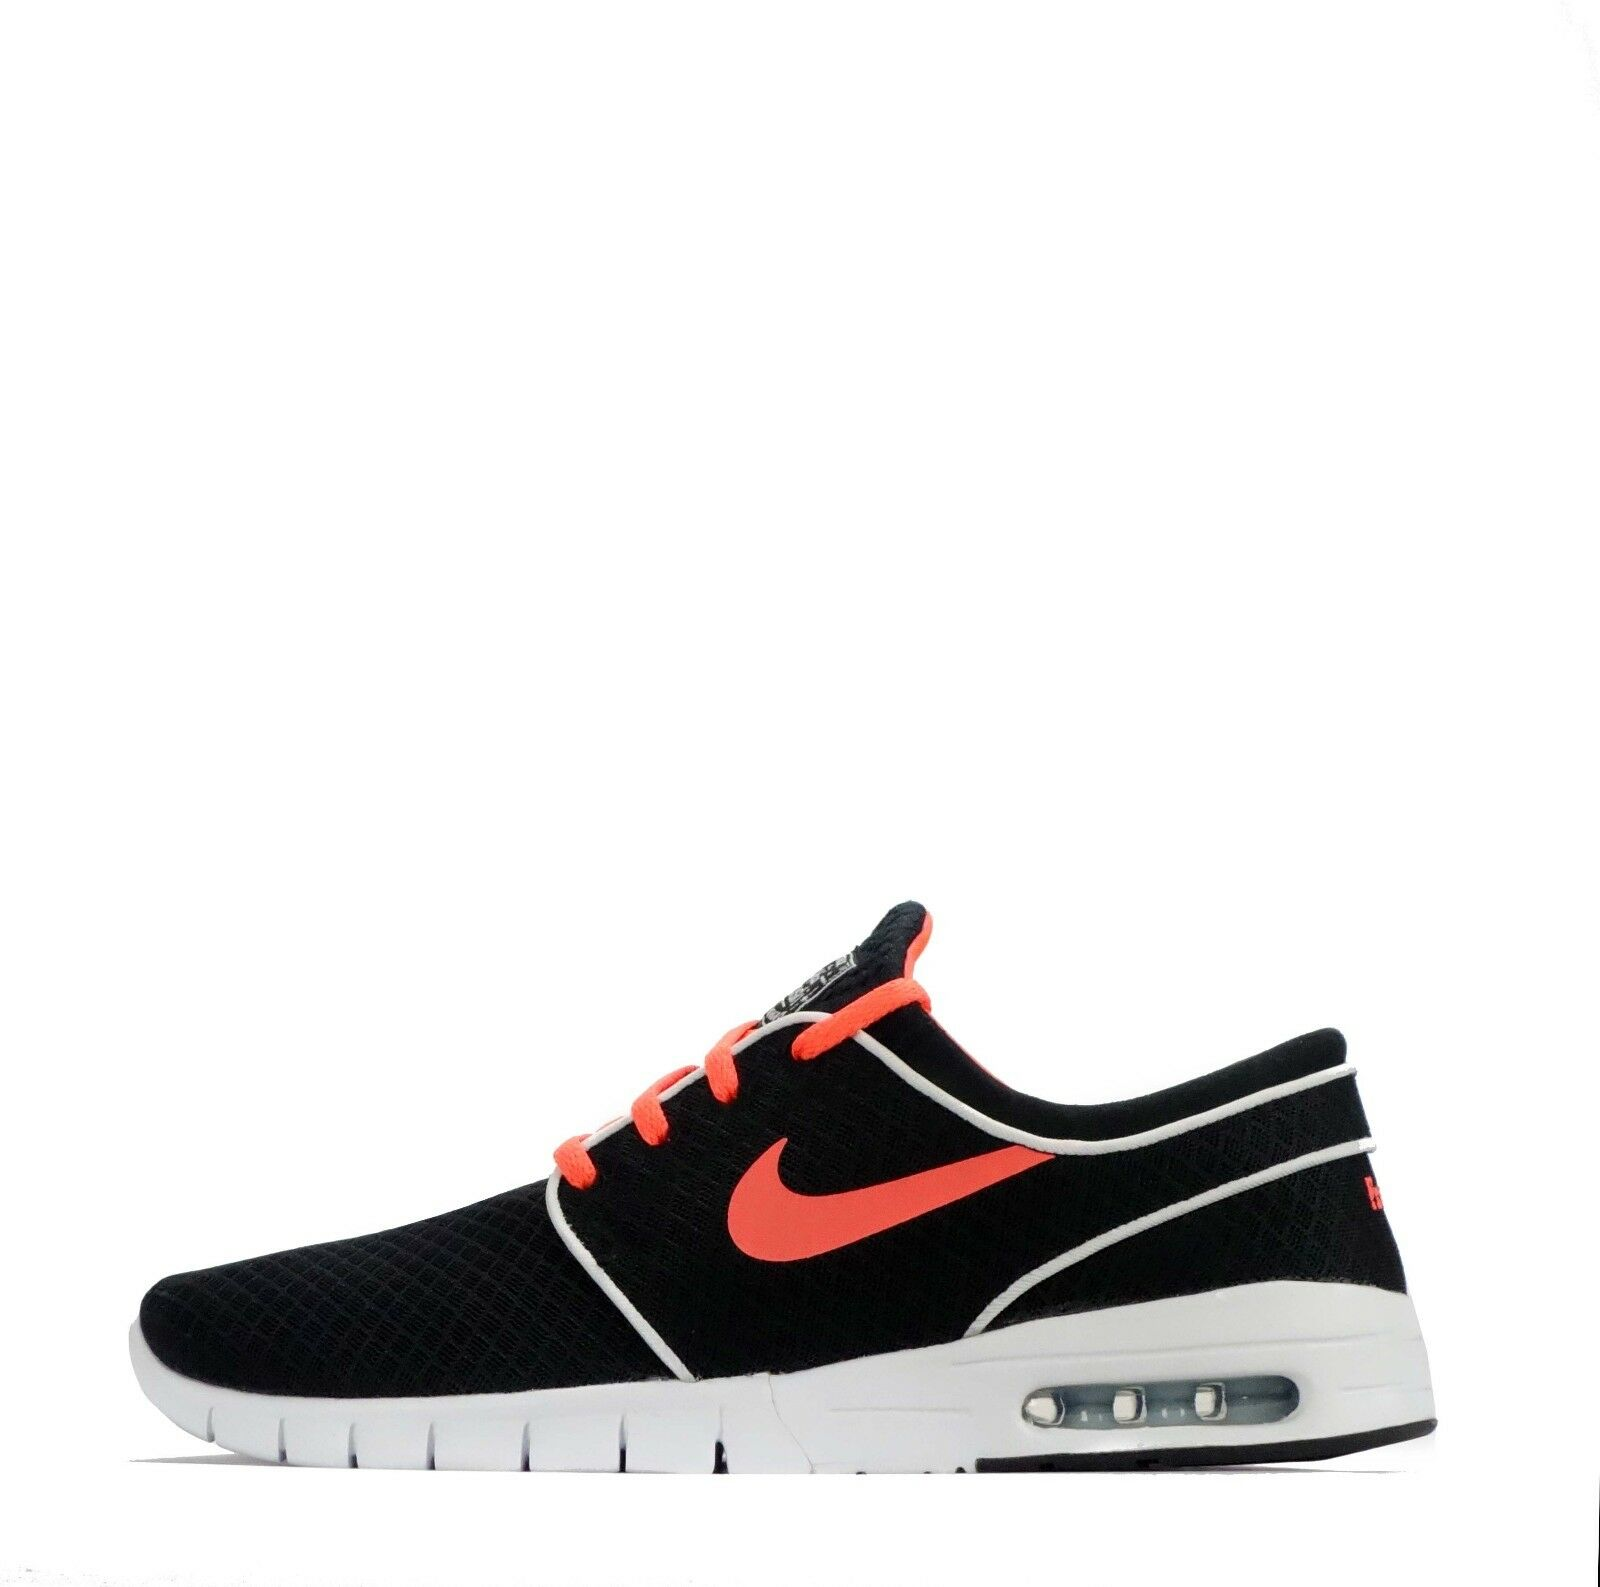 Nike ID Stefan Janoski Max hommes SkateboardingChaussures noir /Orange